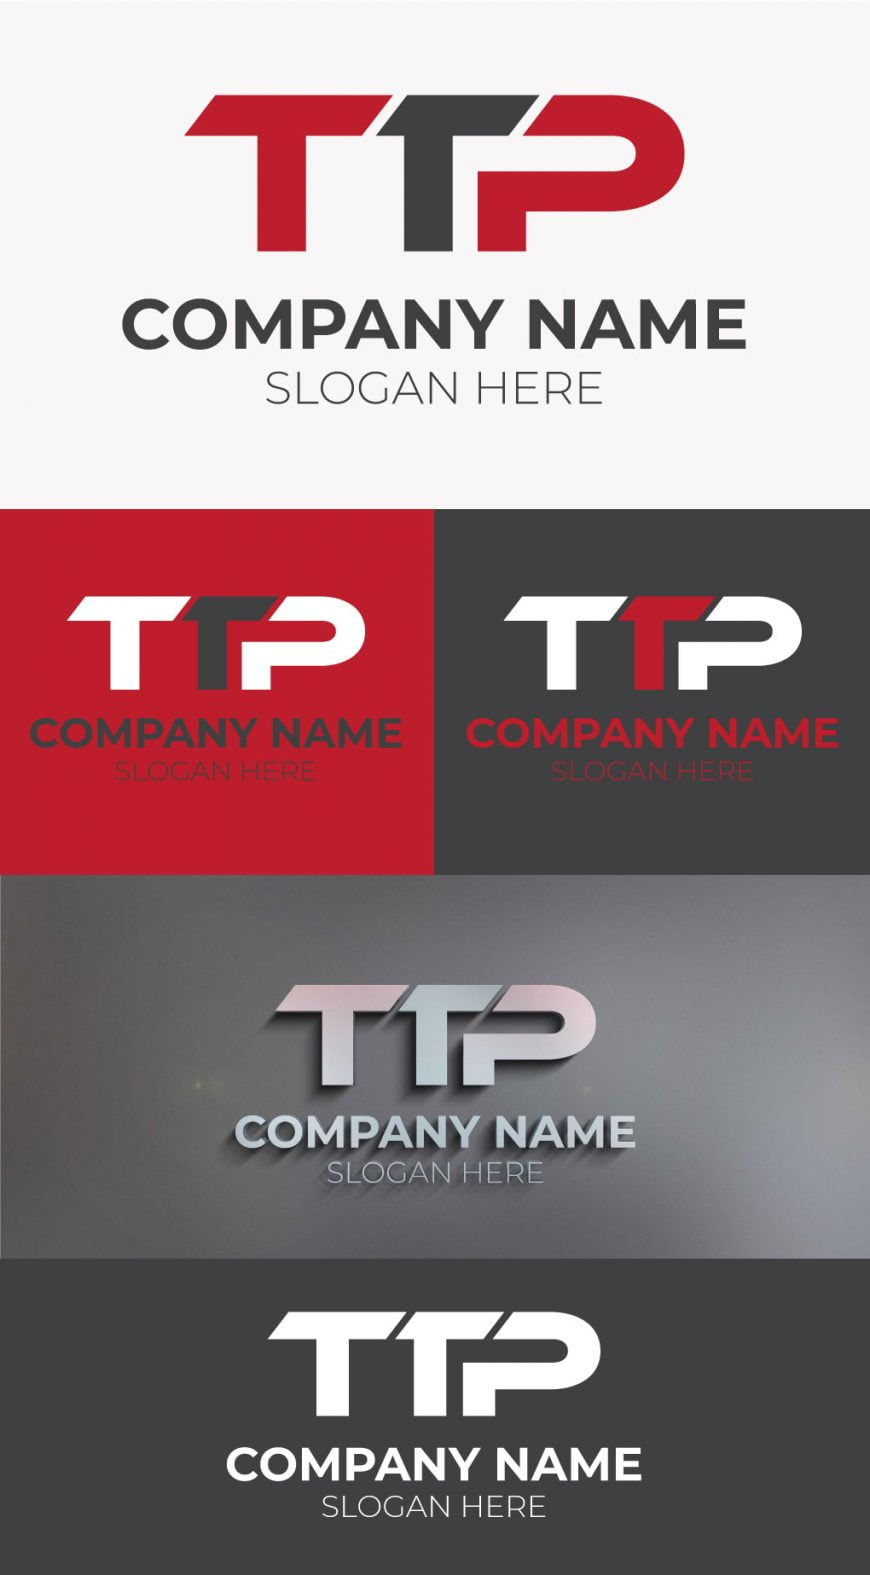 TTP-LOGO-DESIGN-FREE-TEMPLATE